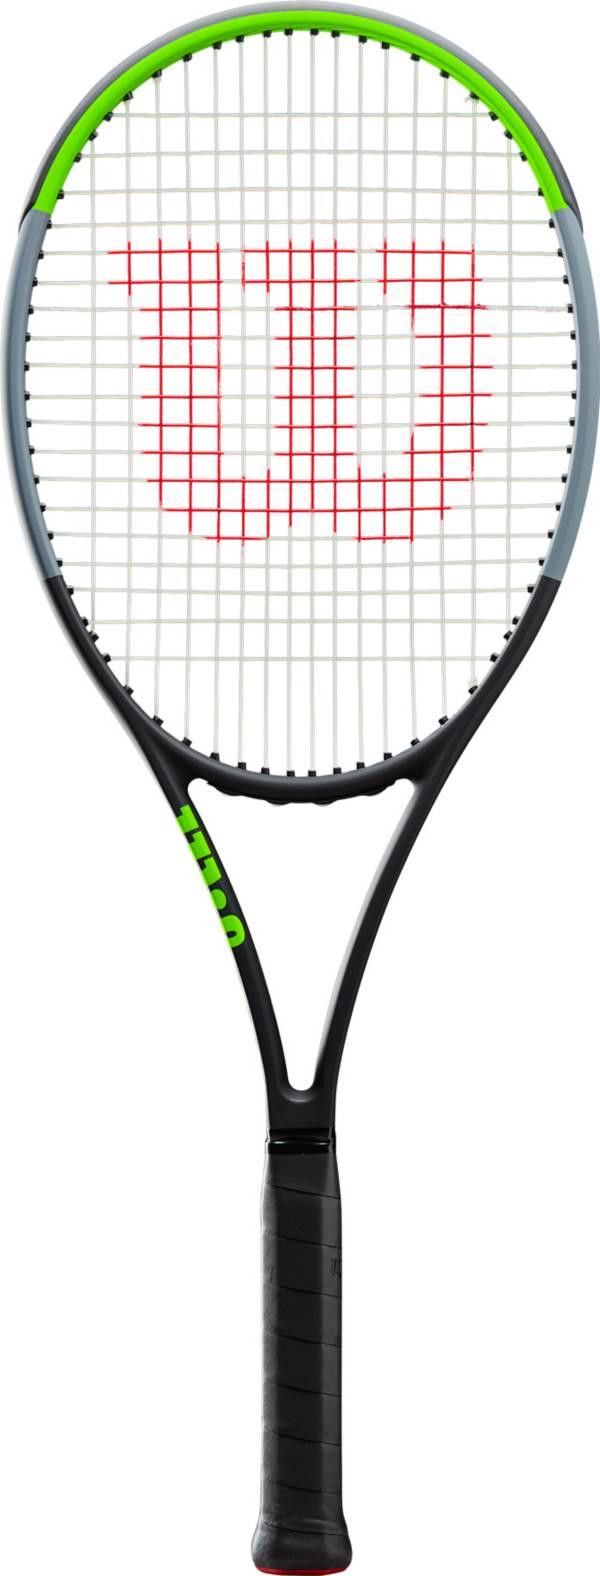 Wilson Blade 98 16x19 V7 Tennis Racquet - Unstrung product image